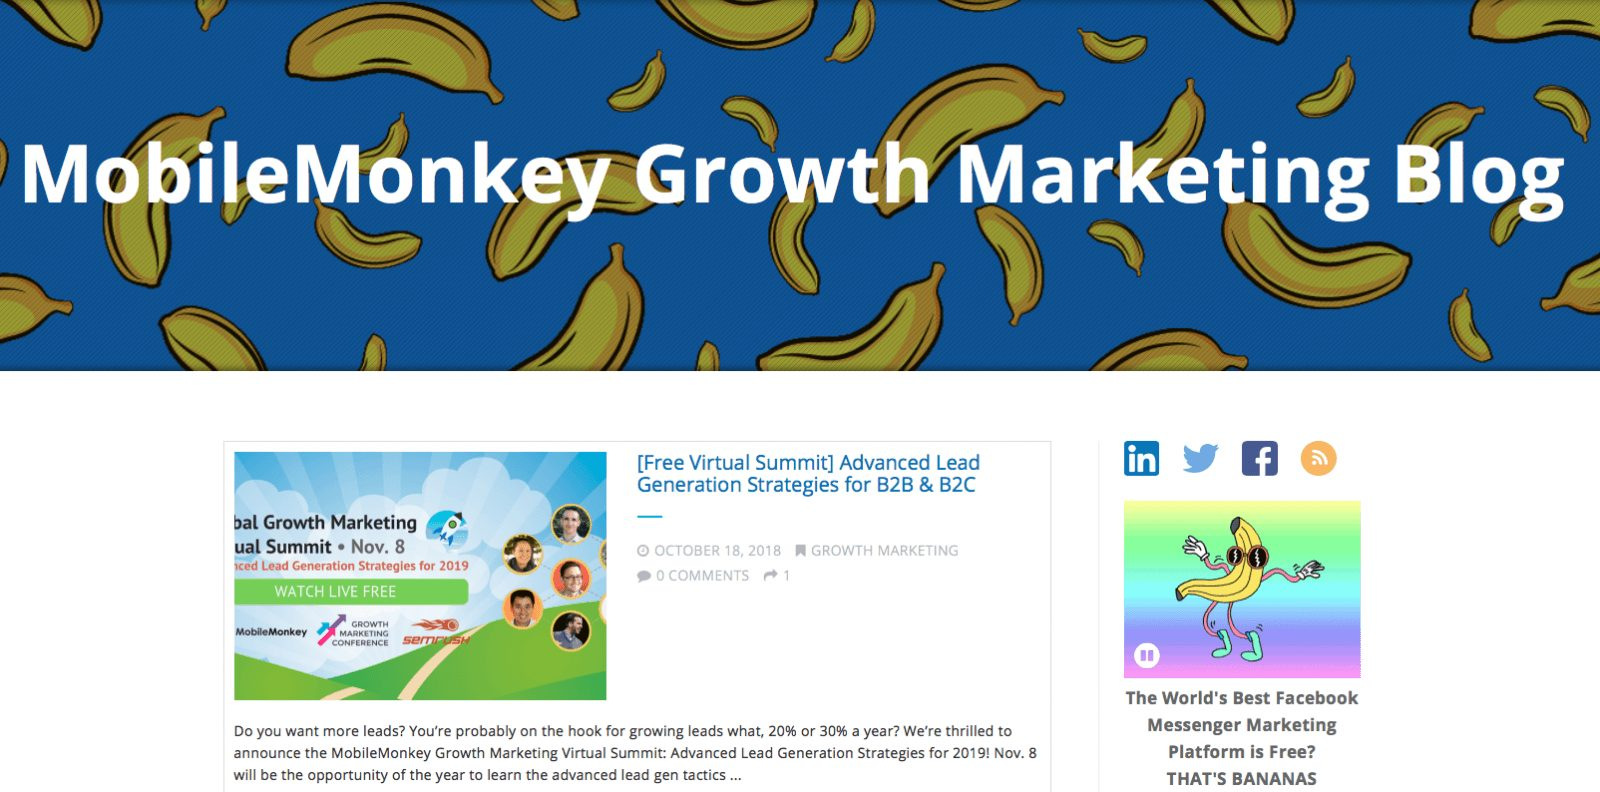 Mobilemonkey marketing blog